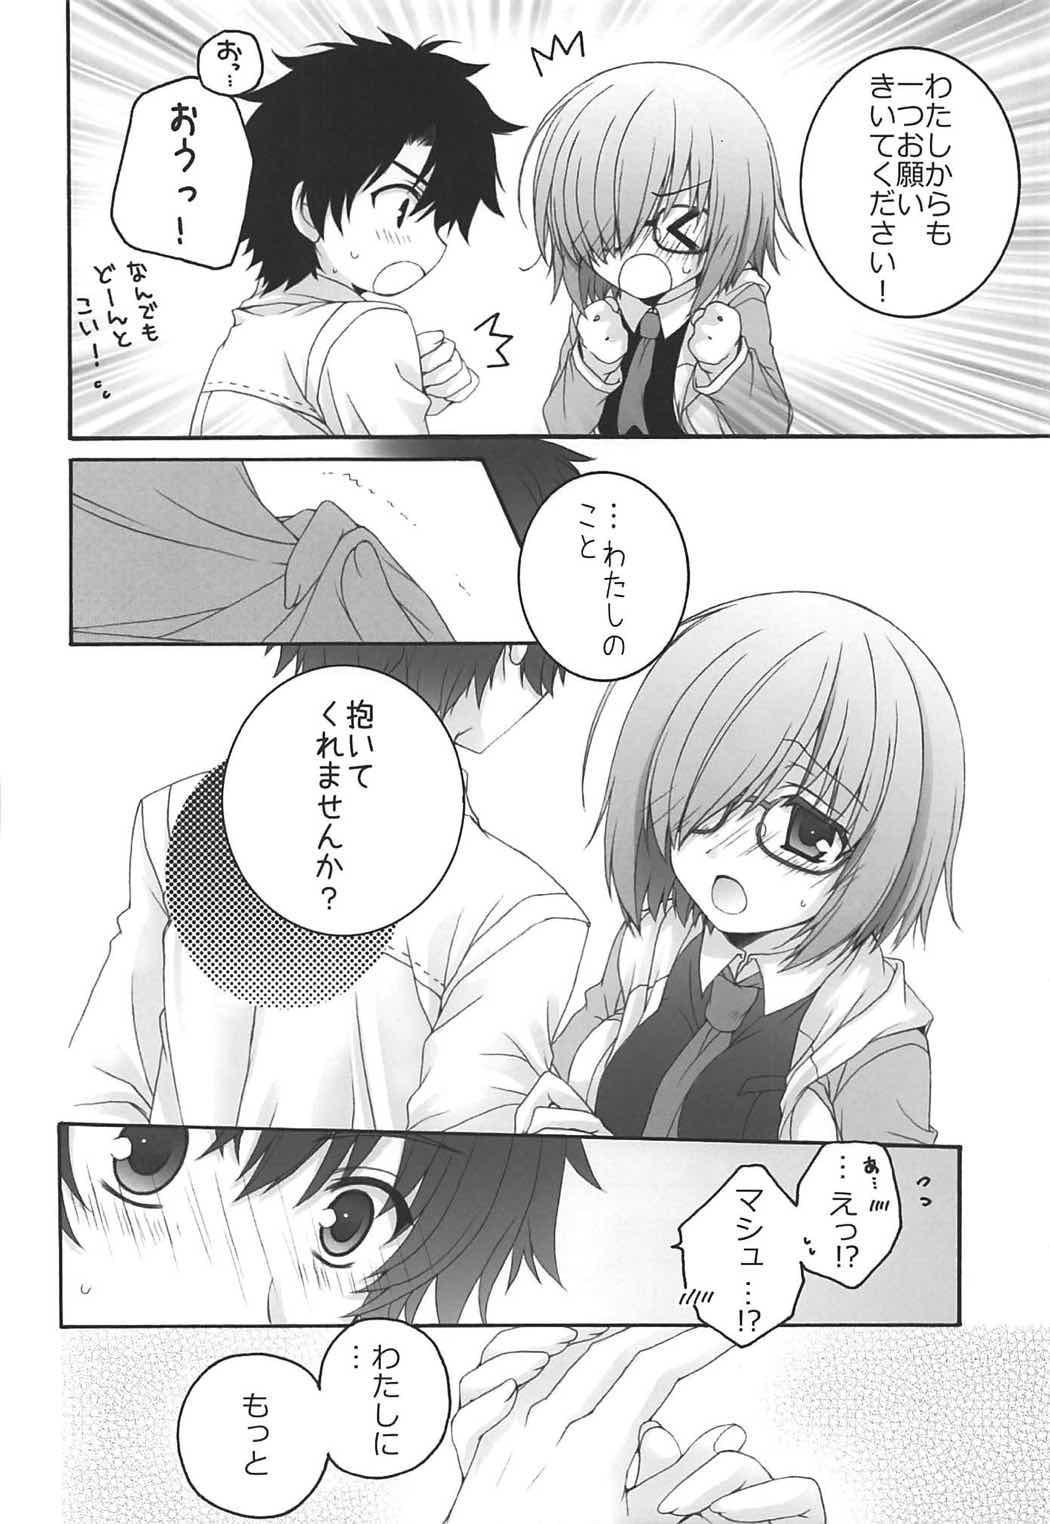 (COMIC1☆11) [Pyonpyororin (Akoko.)] - 1 day ago - (Fate/Grand Order) 10